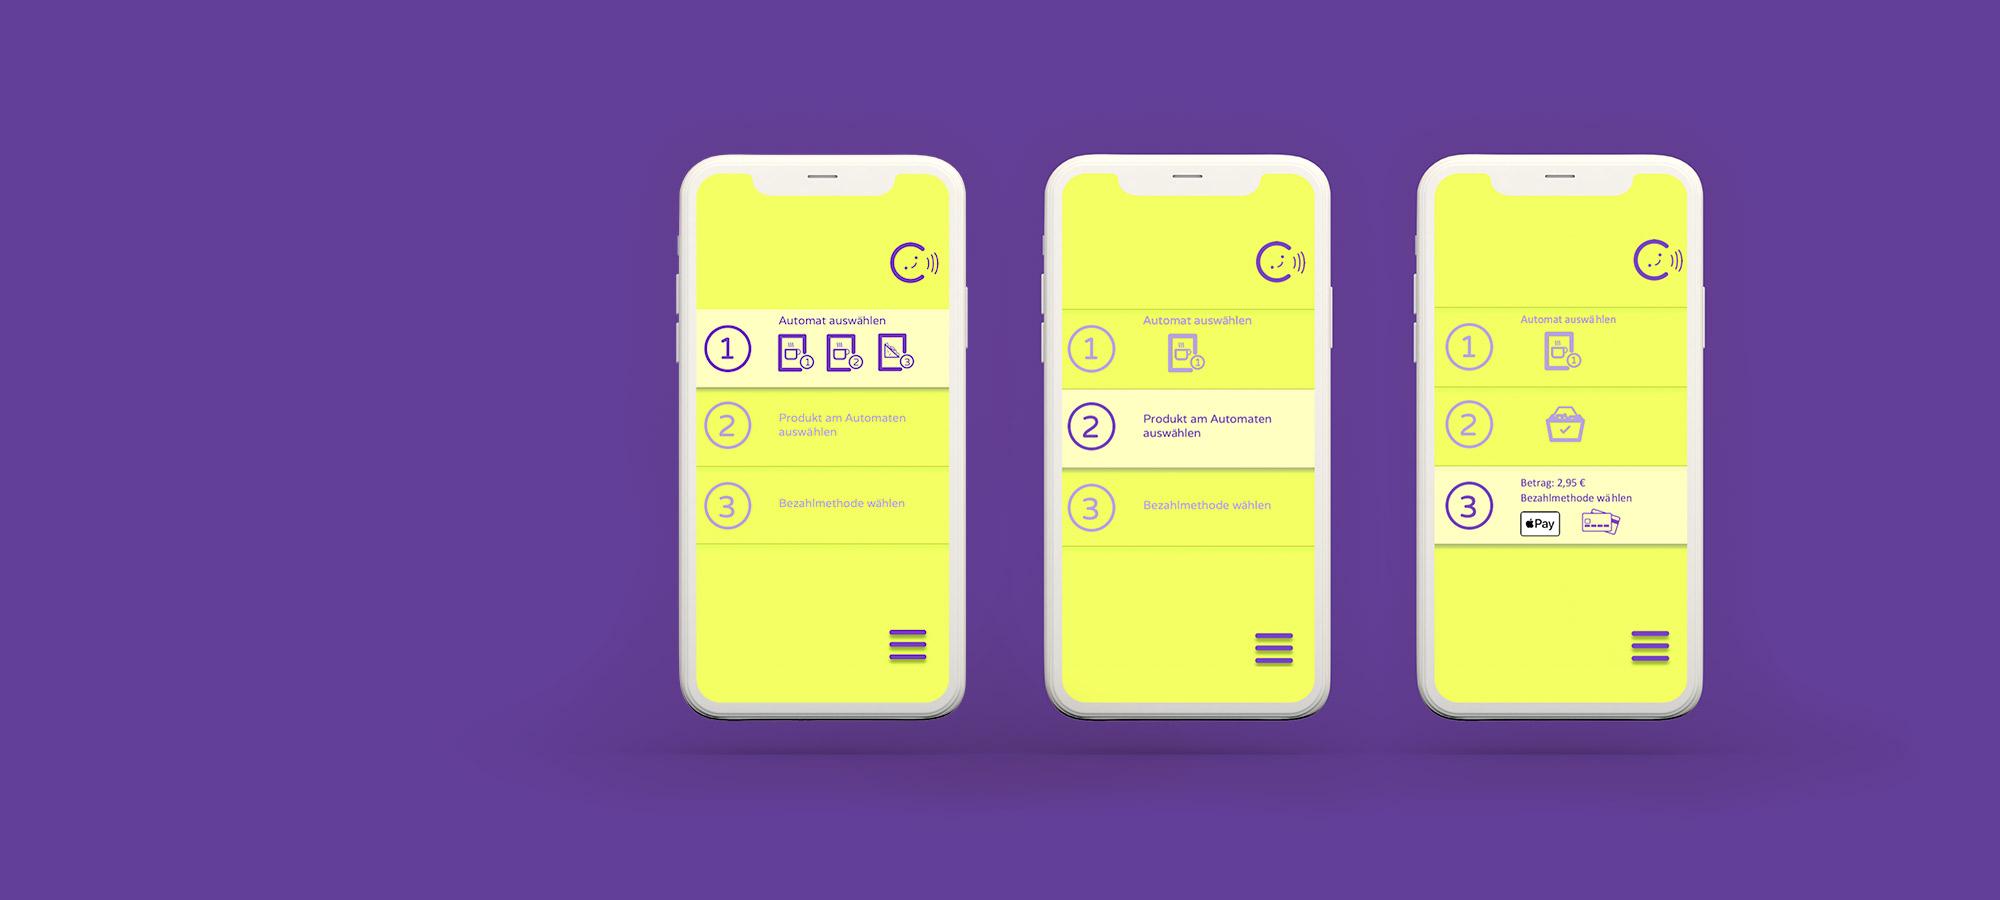 Bargeldlos zahlen per App